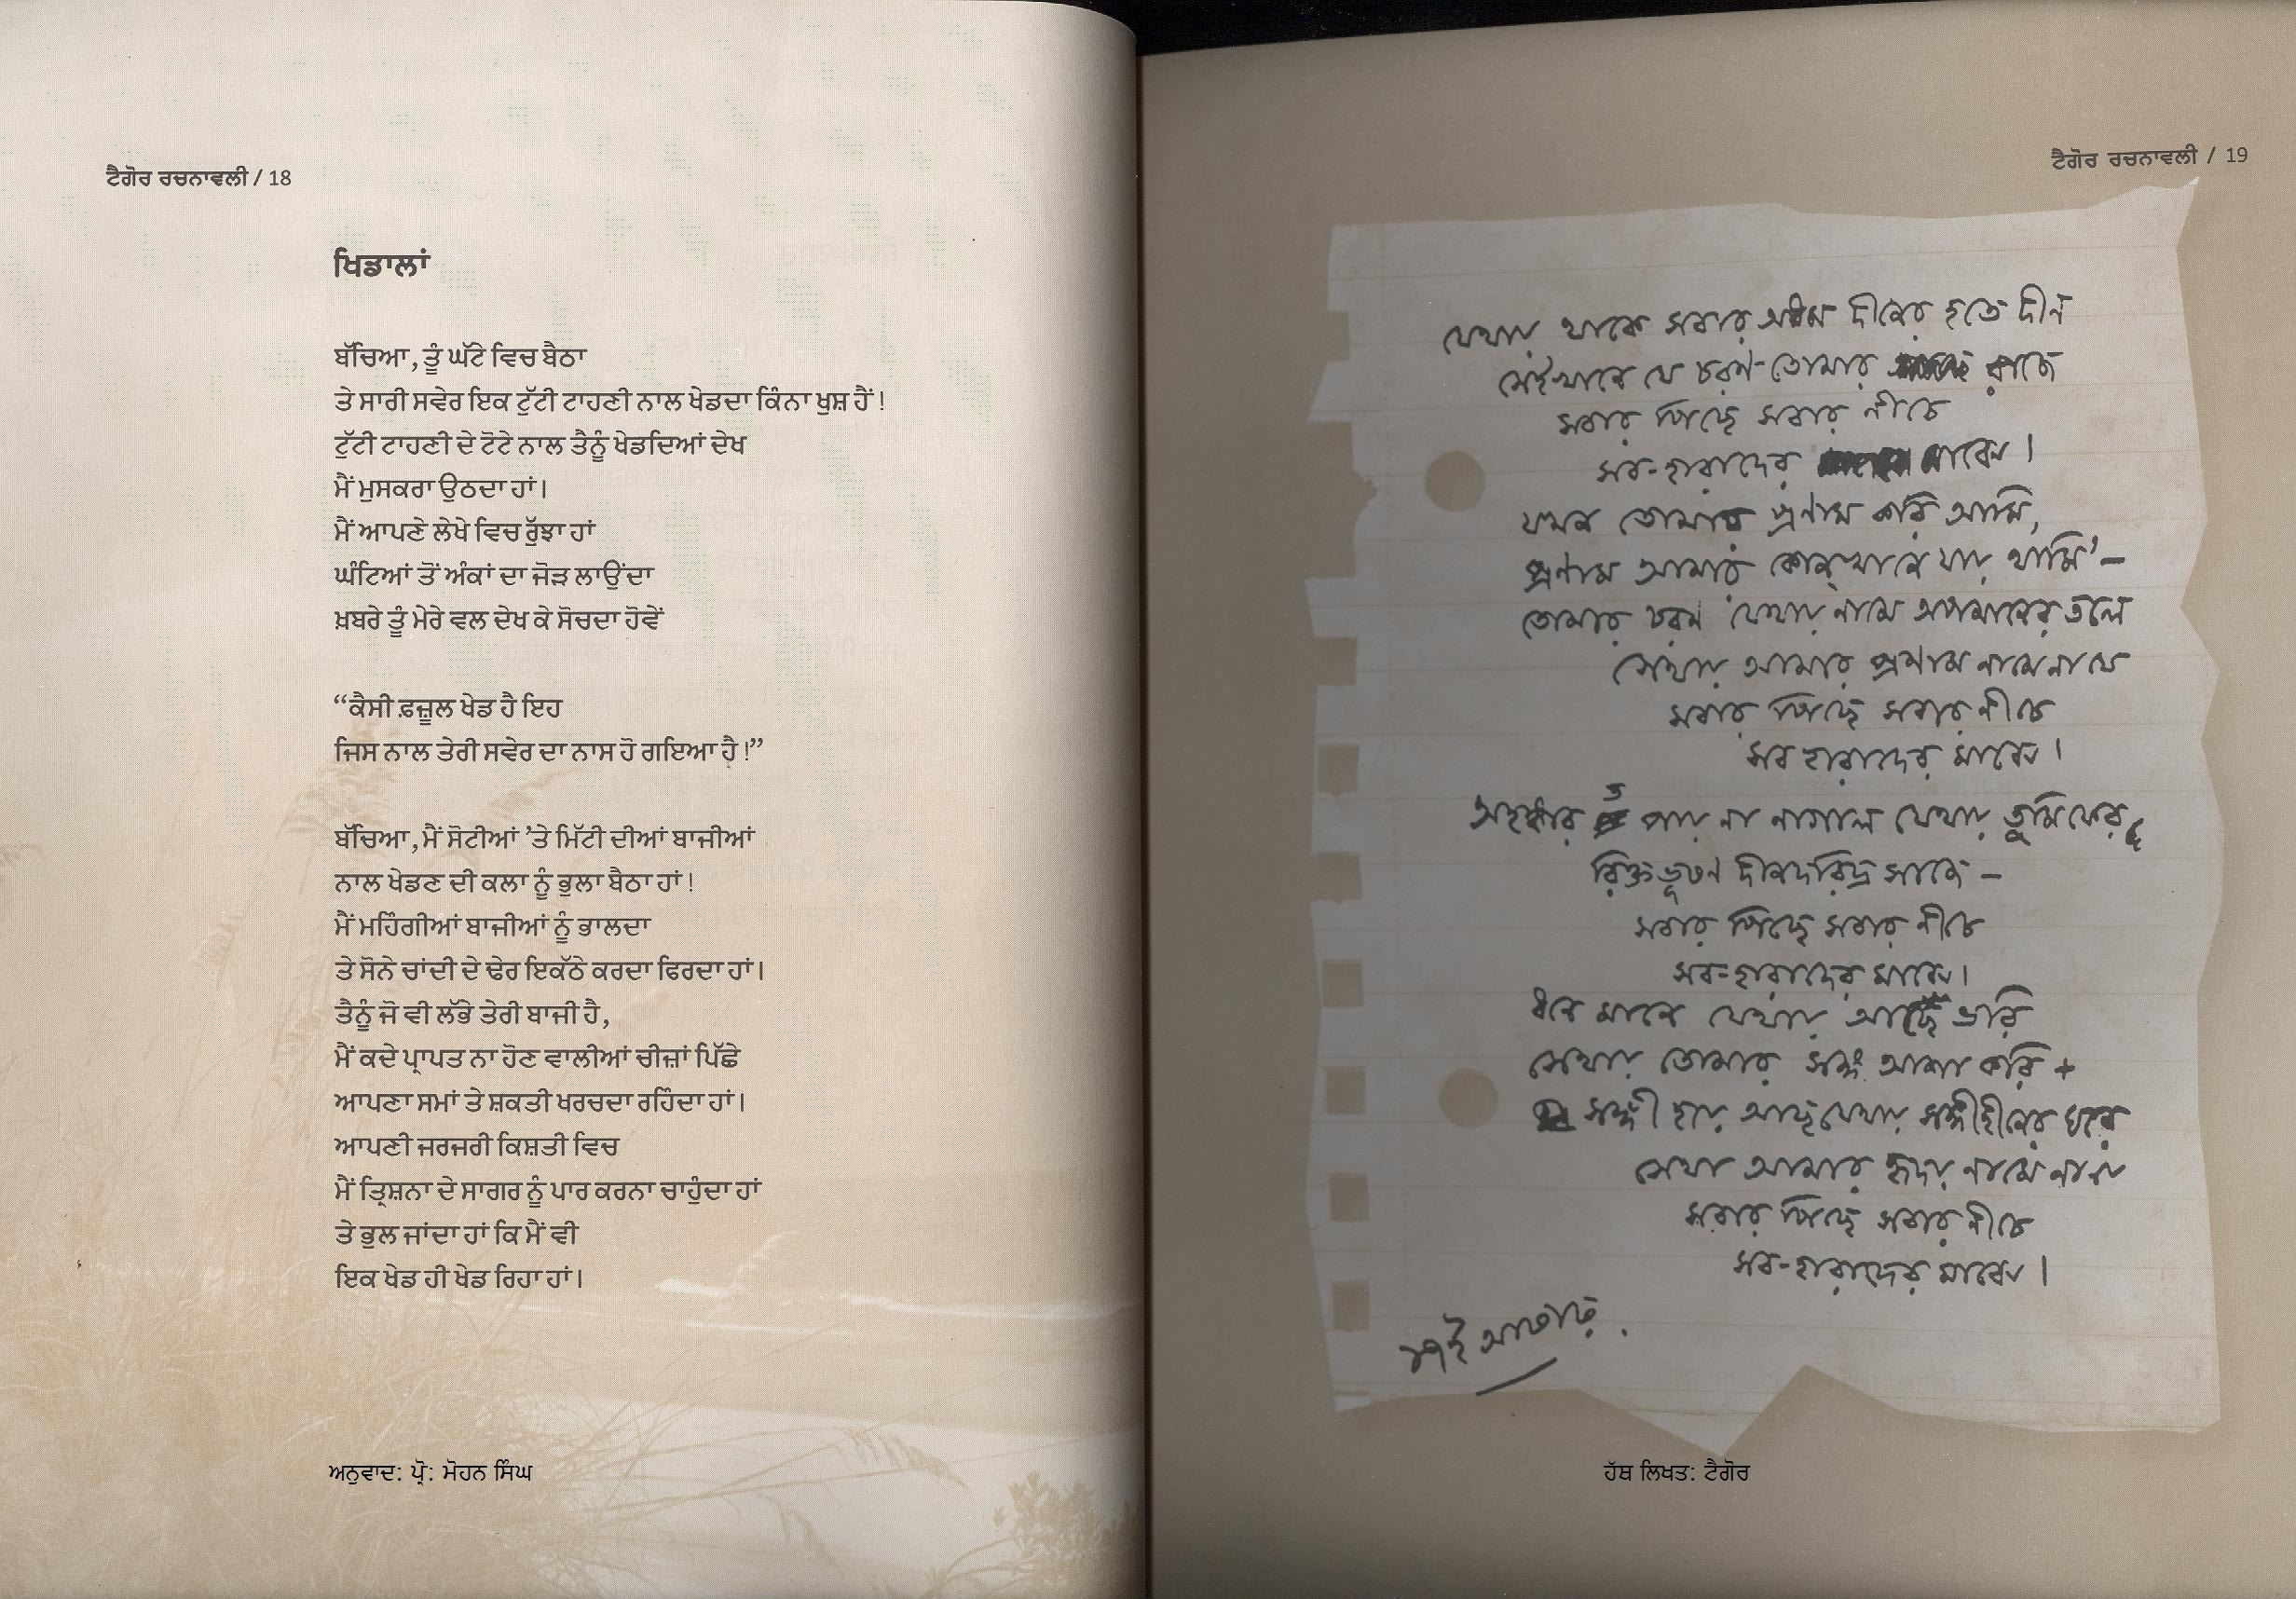 Mohan Singh - Tagore handwriting